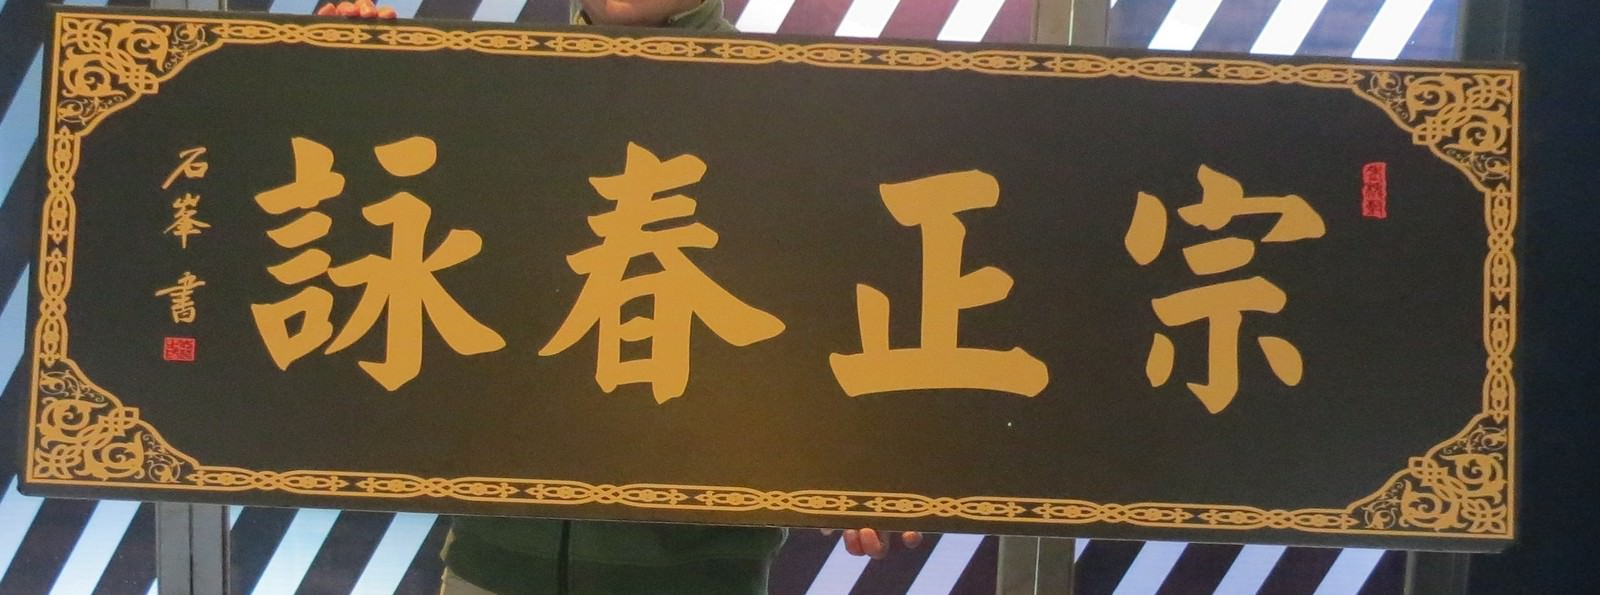 Movie, 葉問外傳:張天志(香港, 2018年) / 葉問外傳:張天志(台灣) / 叶问外传:张天志(中國) / Master Z: Ip Man Legacy(英文), 特映會現場